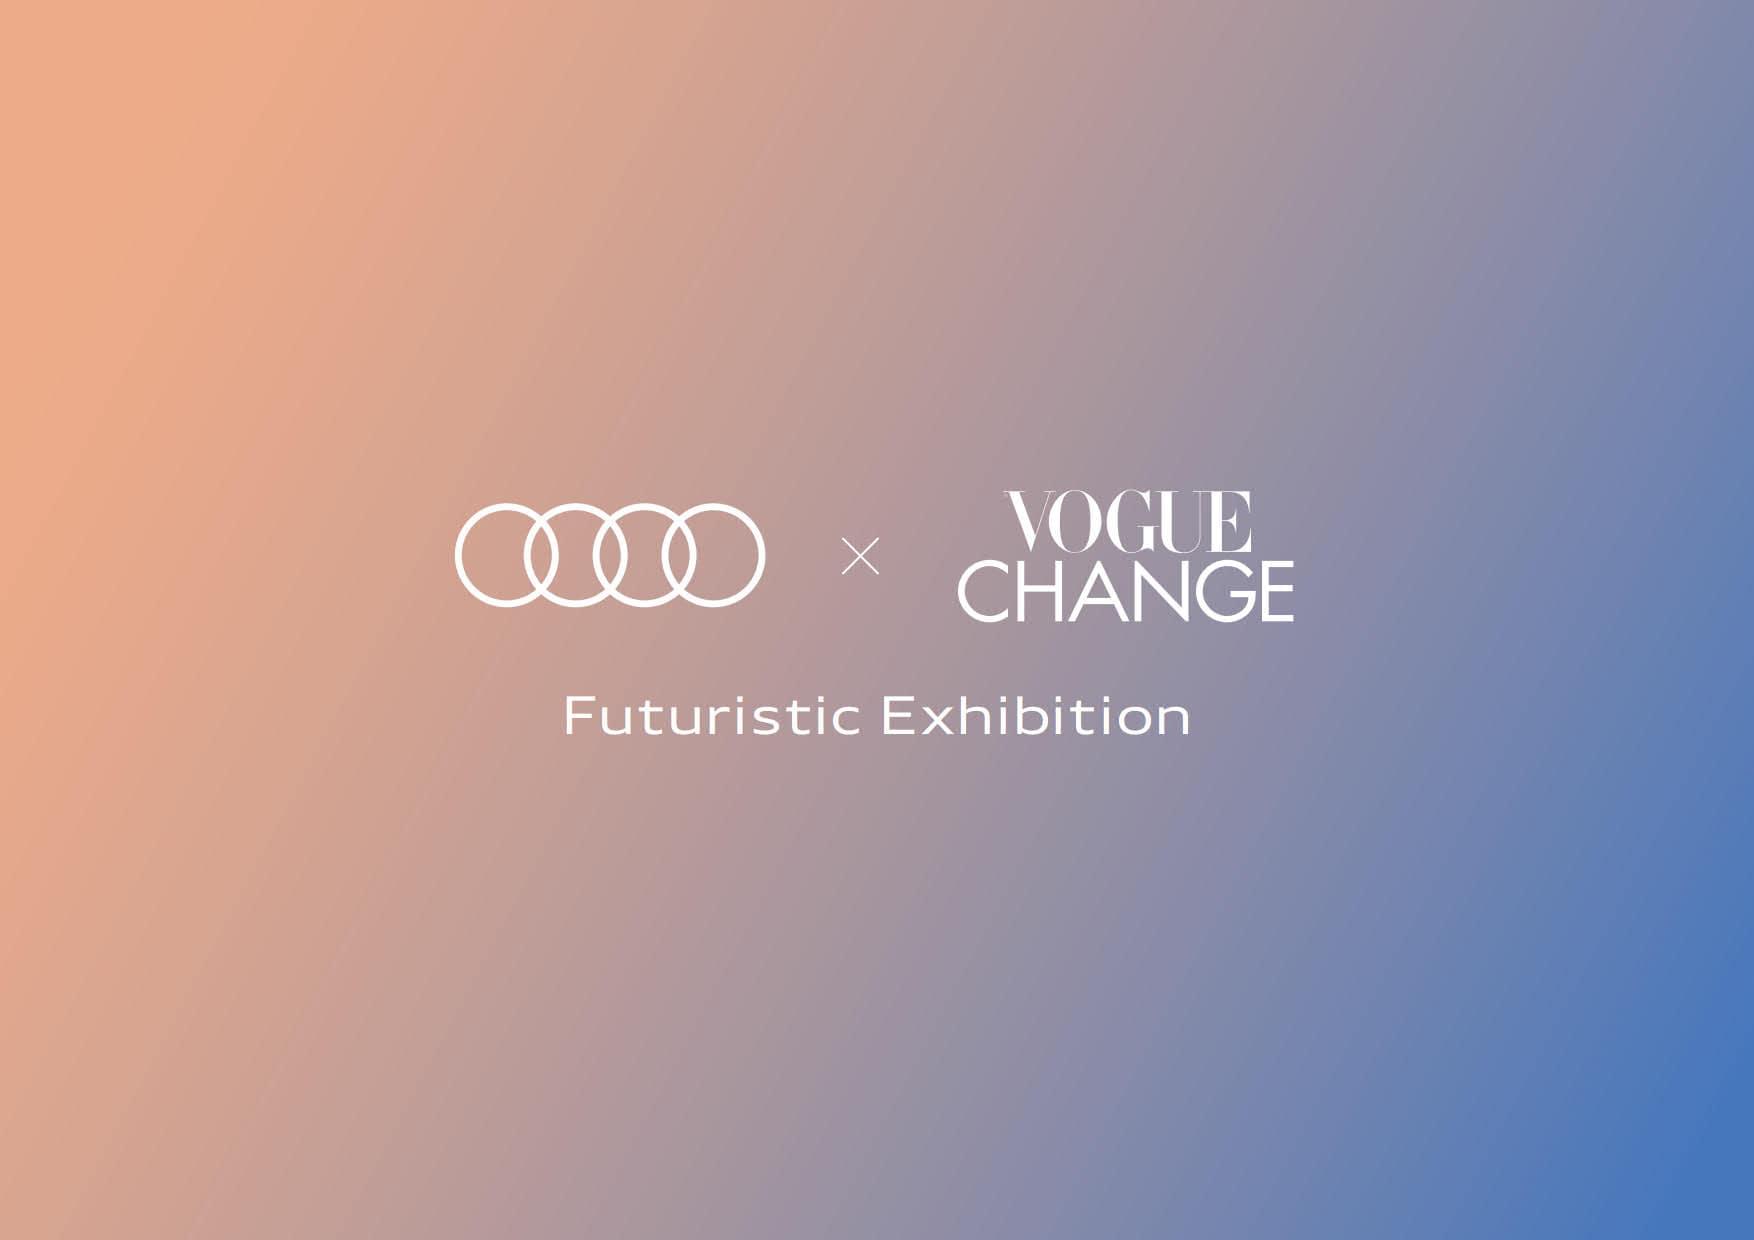 『Audi × VOGUE CHANGE Futuristic Exhibition』